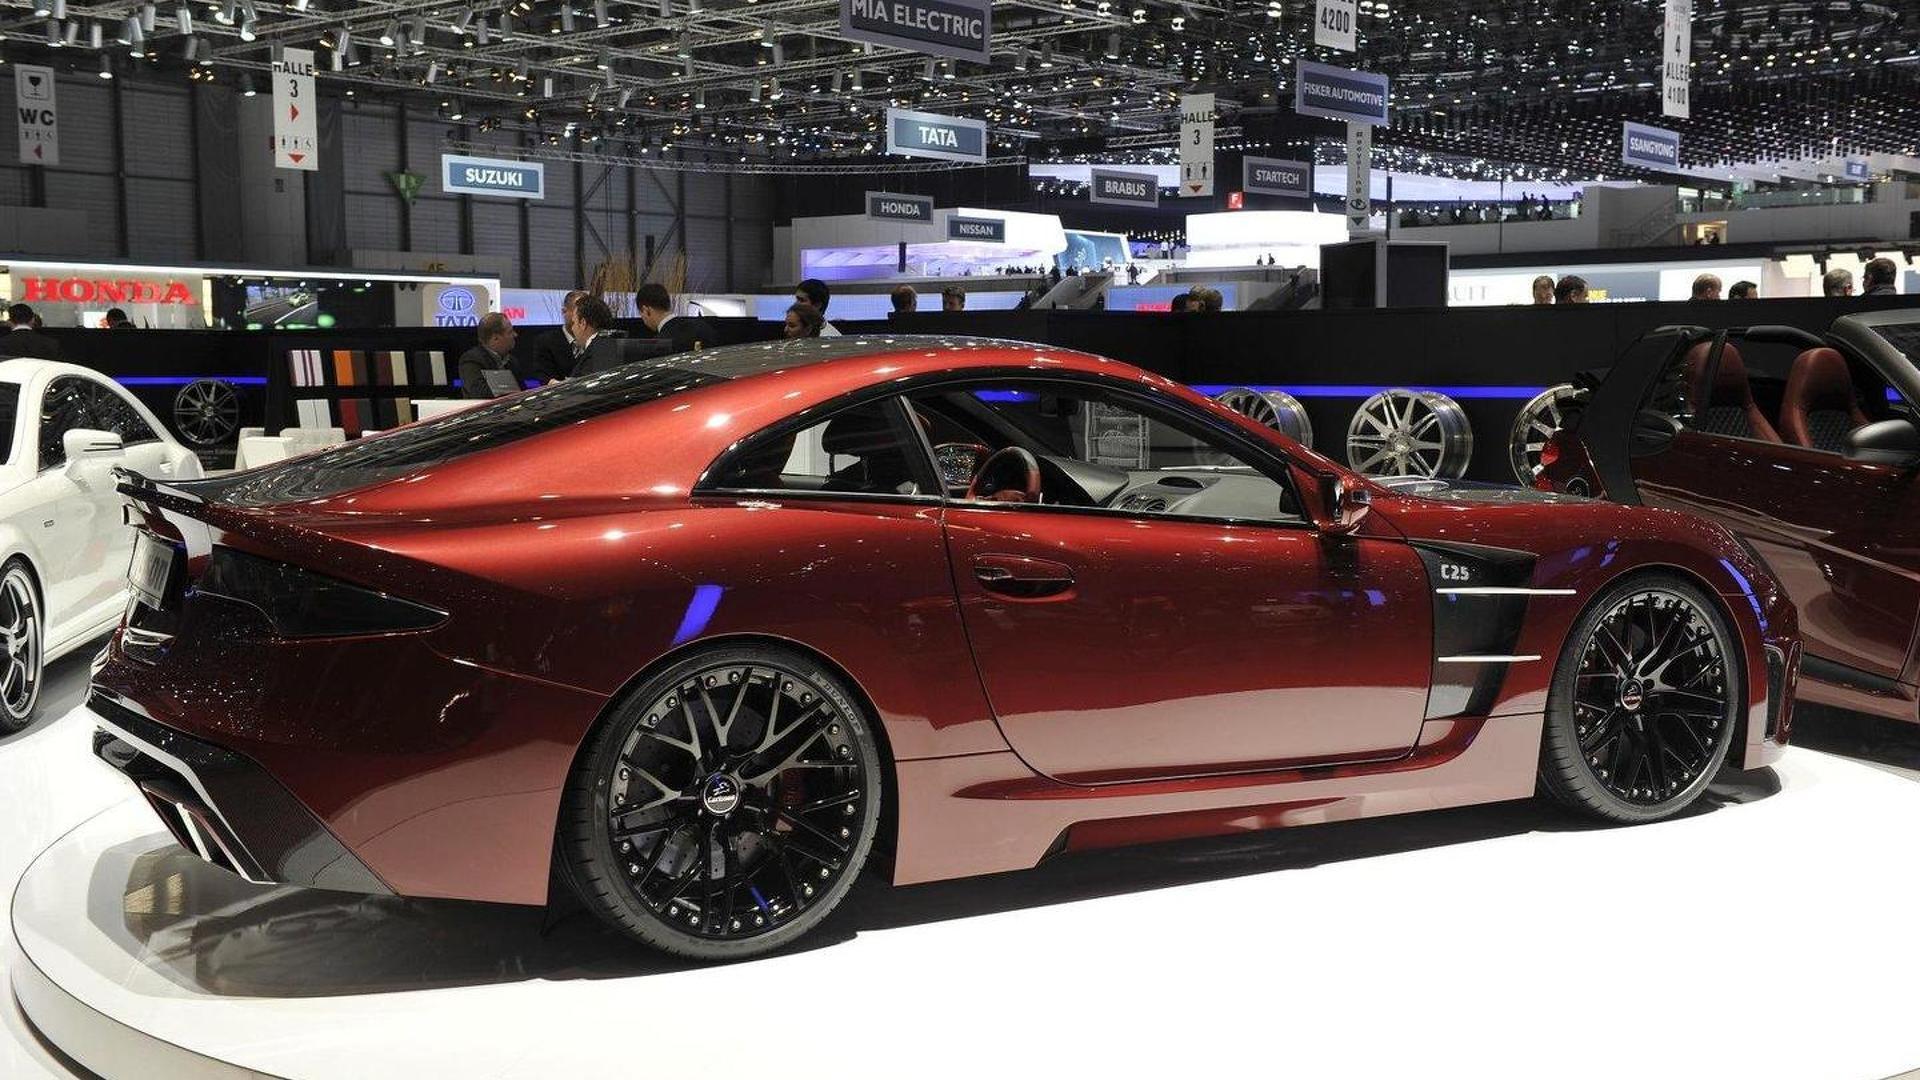 Carlsson C25 Royale Super GT world premiere in Geneva